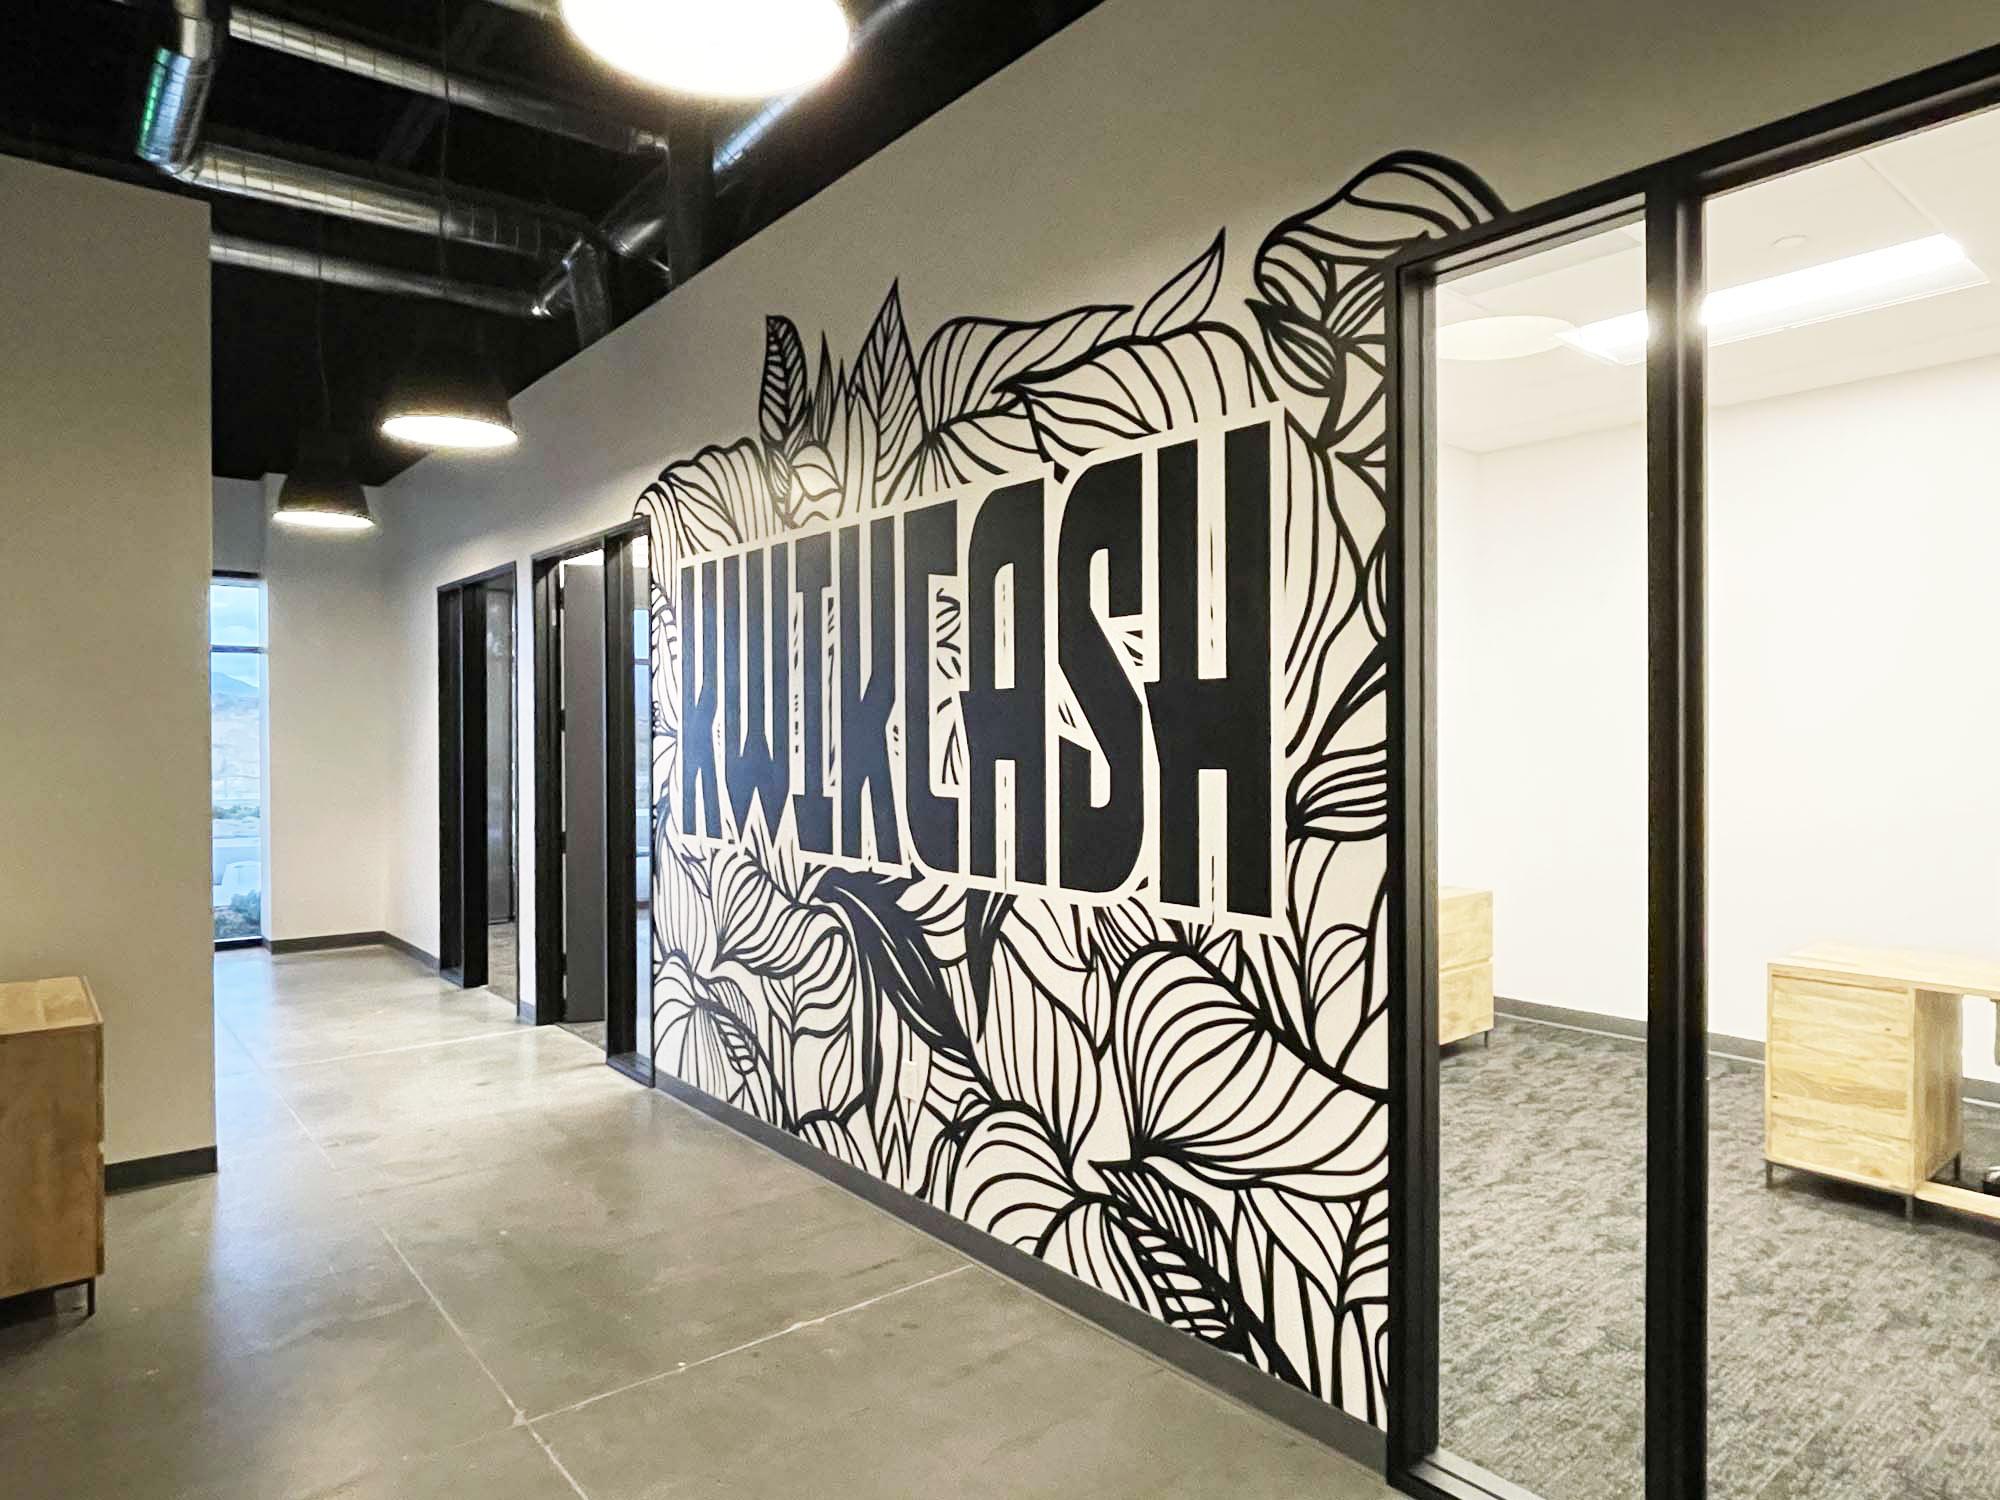 B&W Street Art Mural for KwikCash